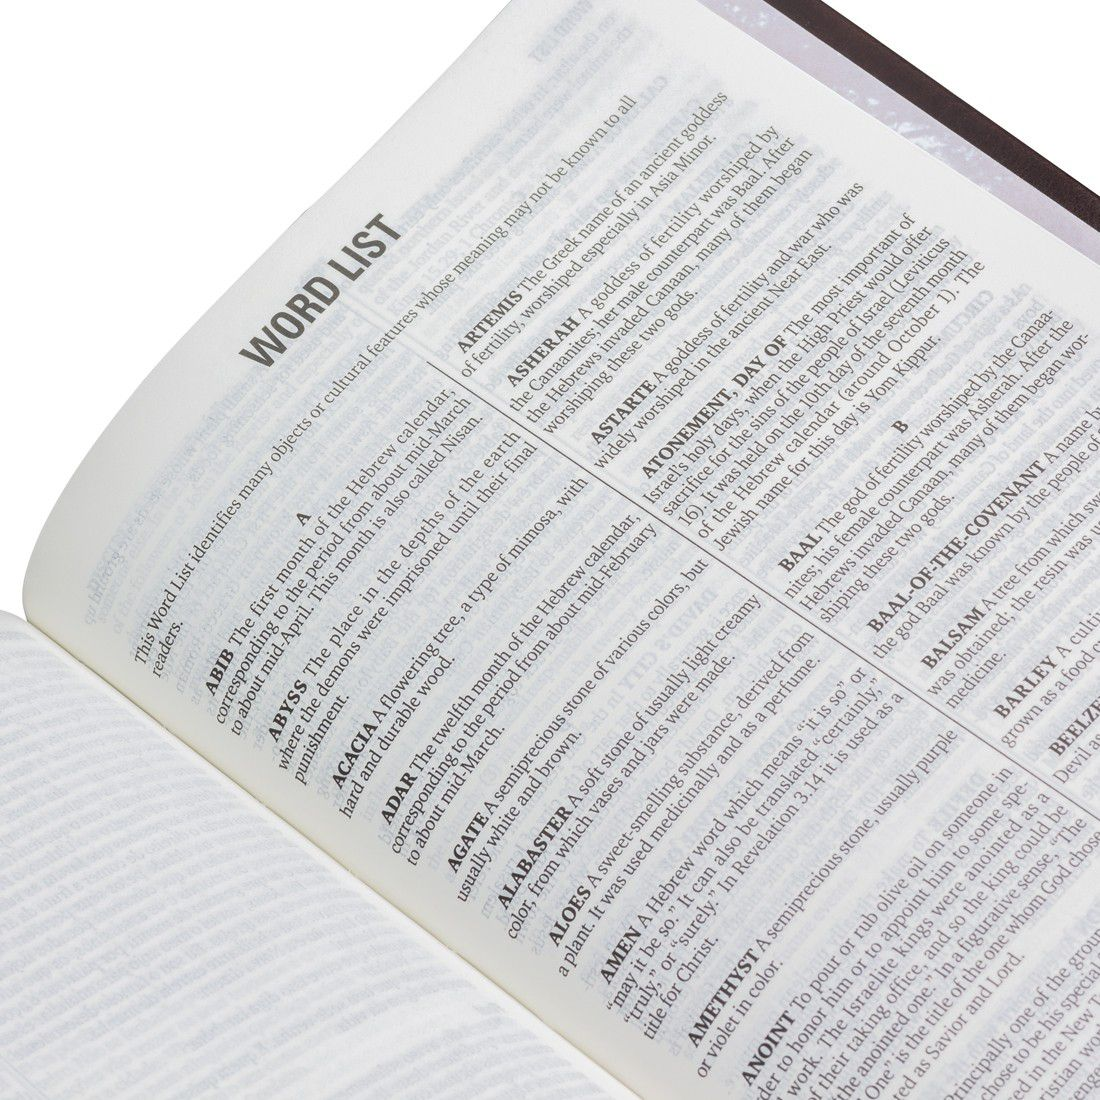 Bíblia Bilíngue Português Inglês - Capa Luxo - NTLH